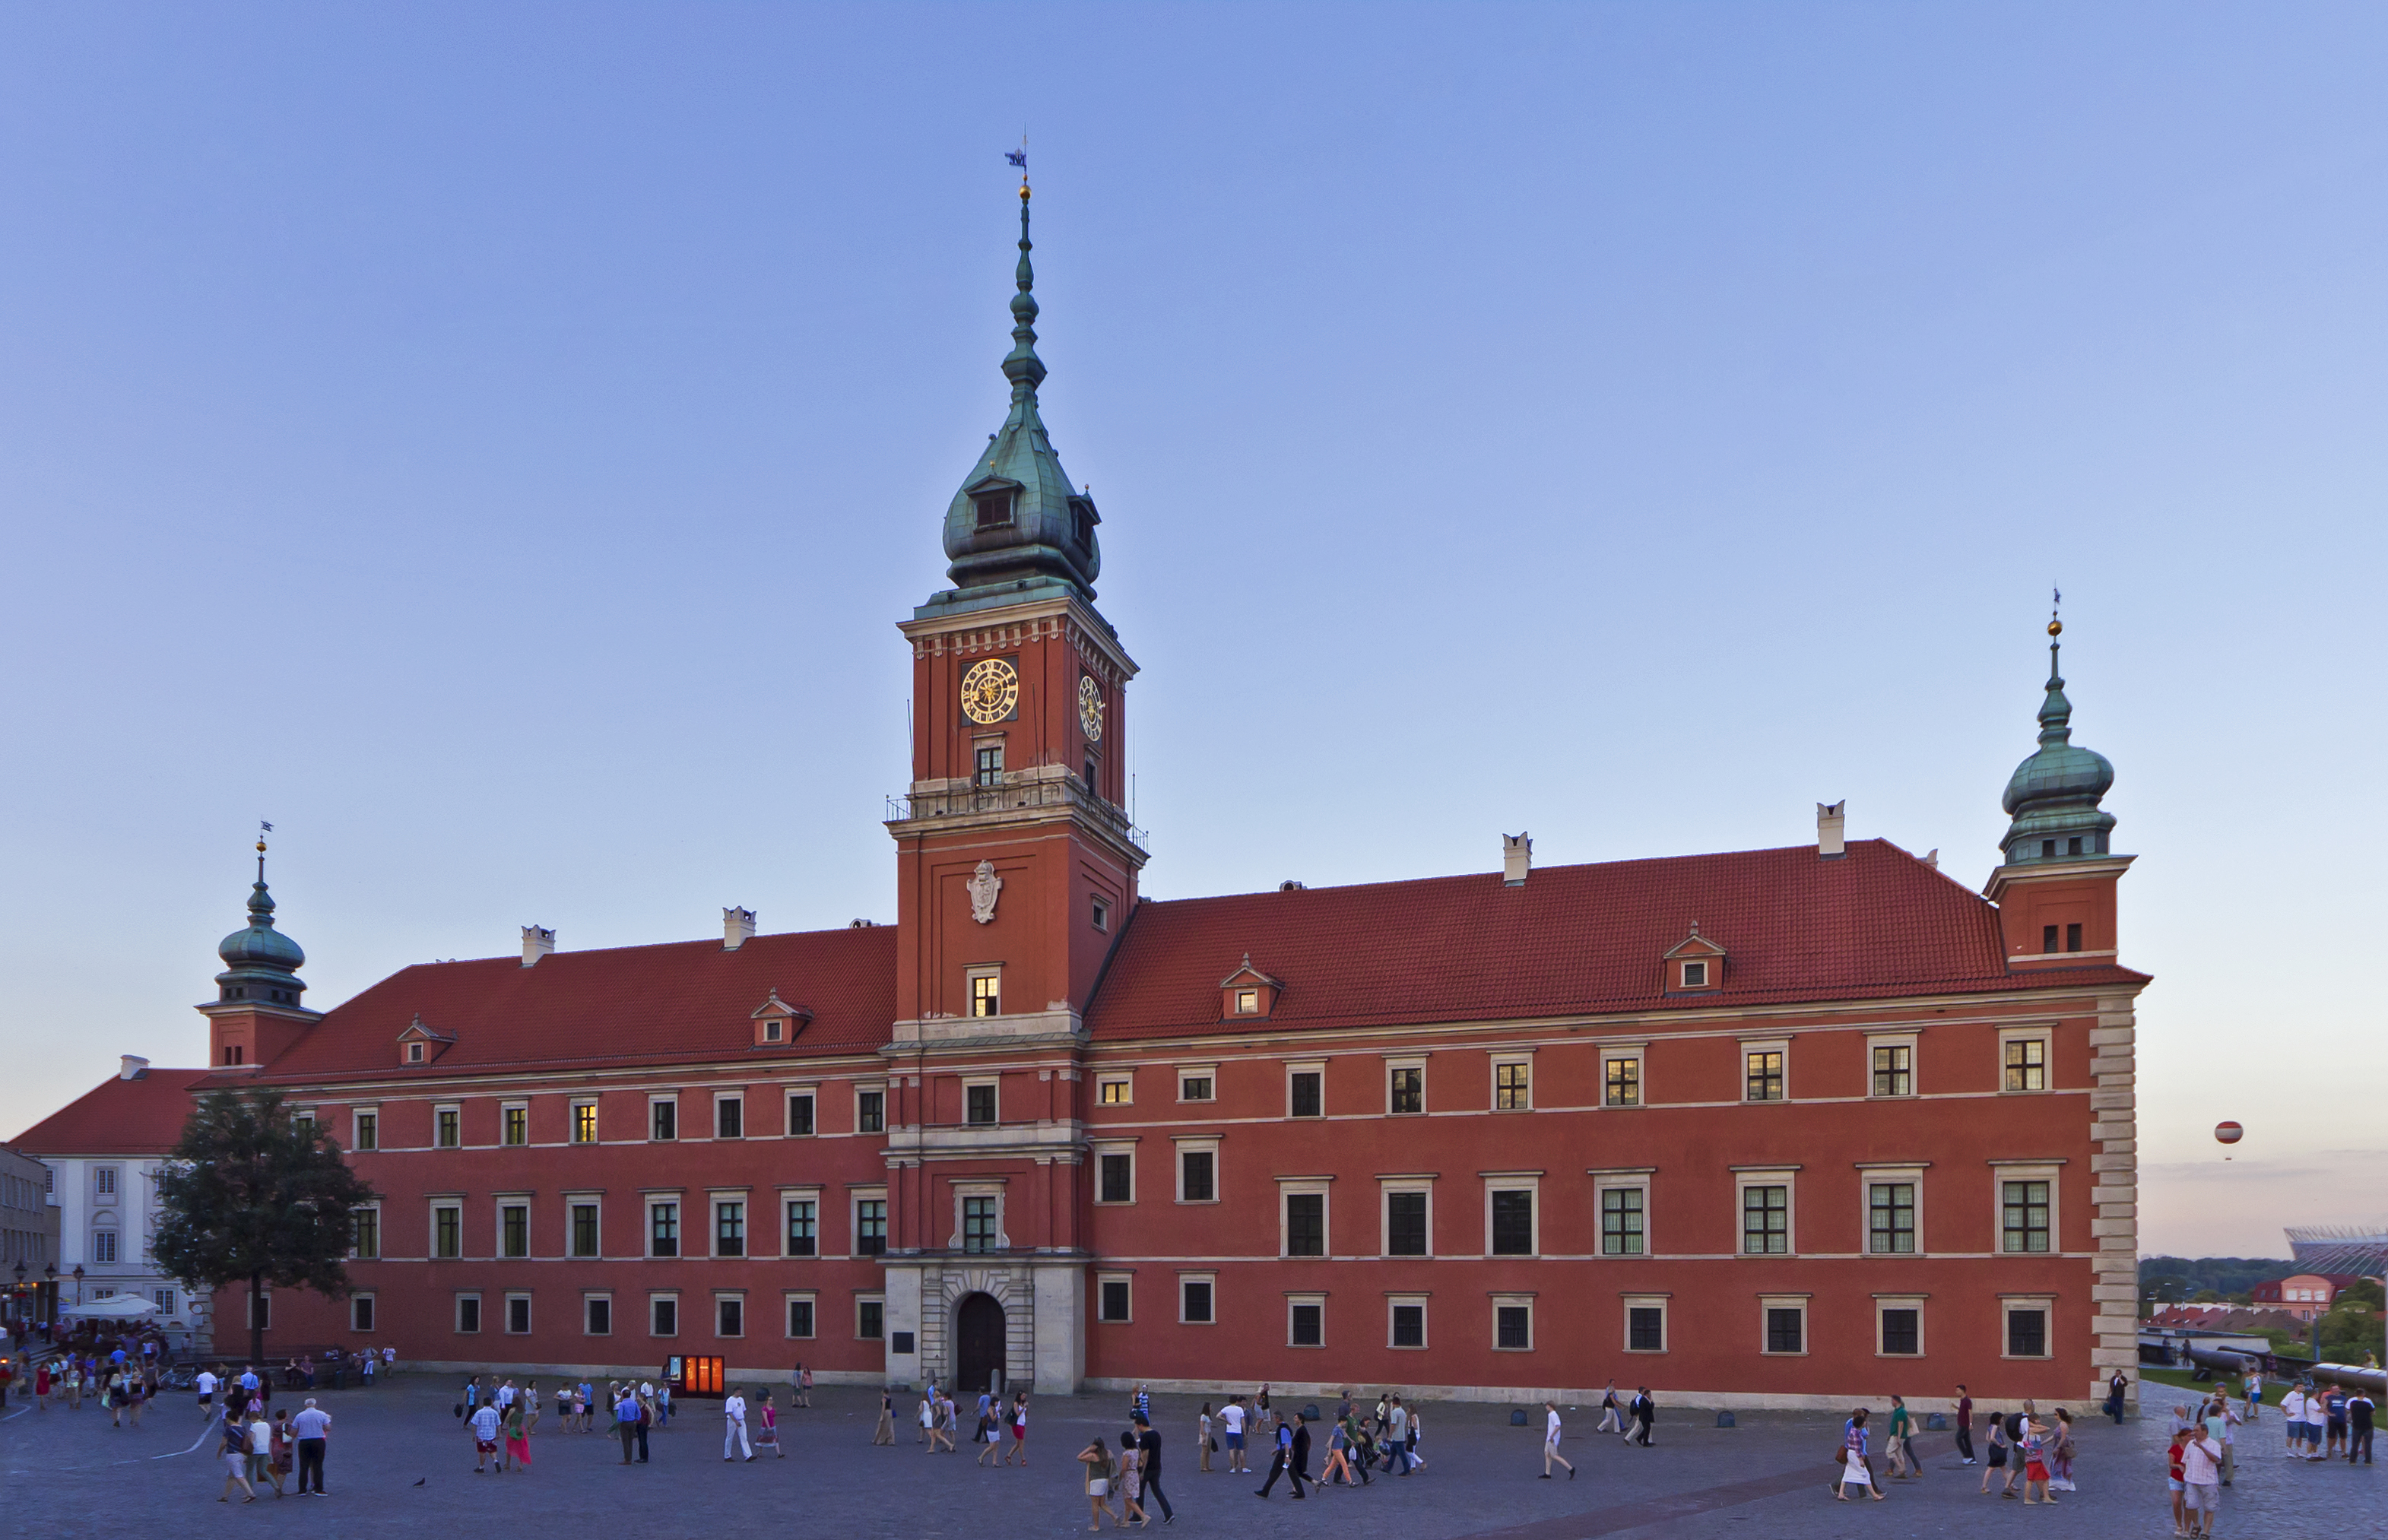 Warsaw palace square